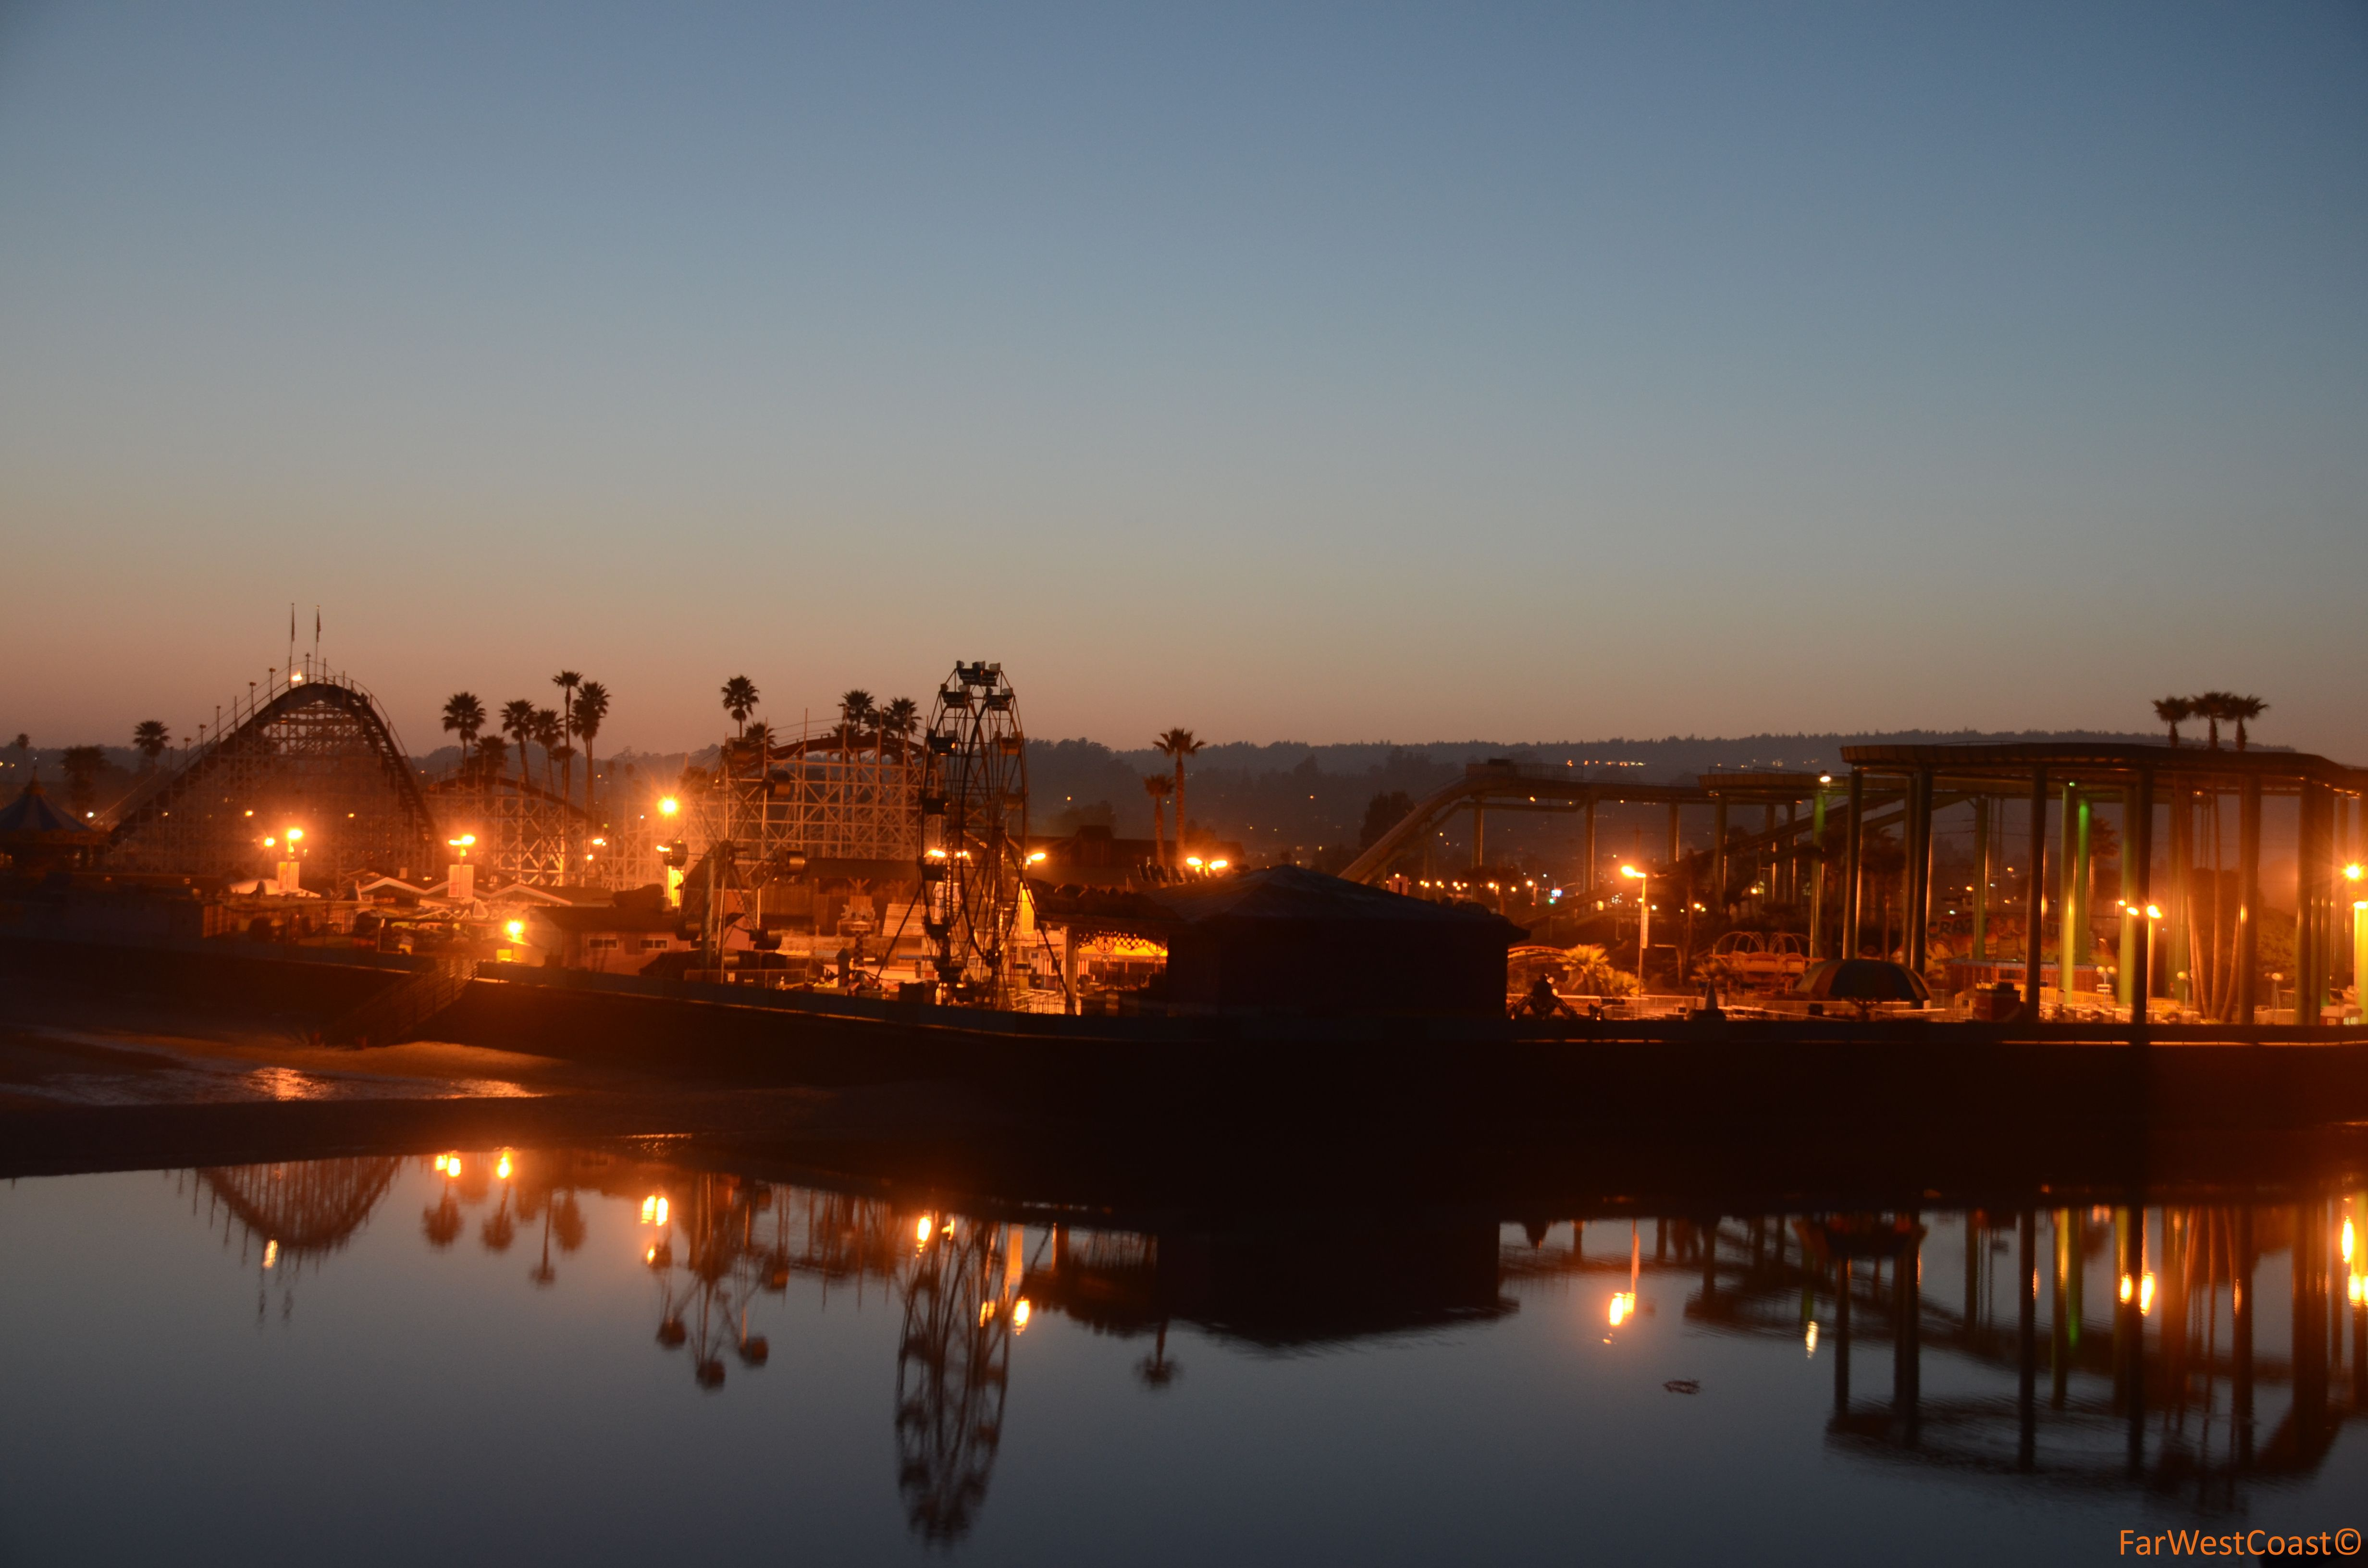 Santa Cruz, c\'est beau la nuit (aussi), ça brille ! #Boardwalk ...